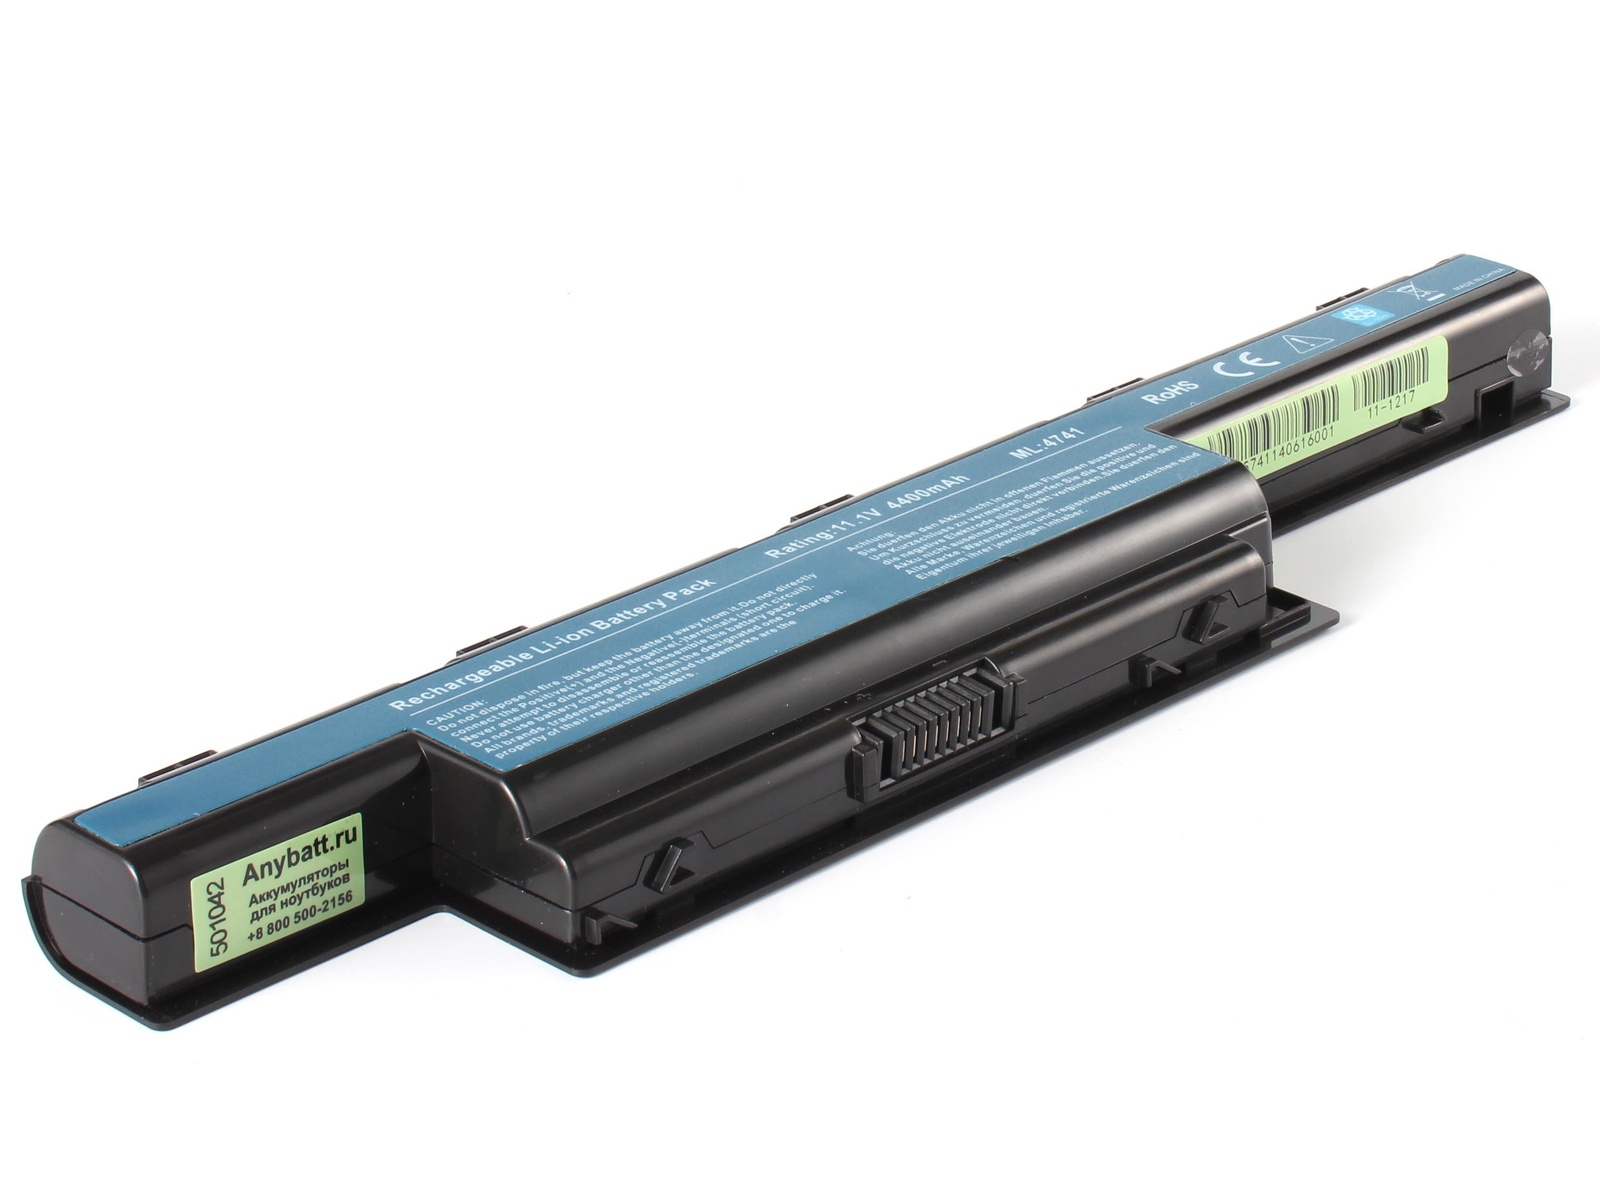 Аккумулятор для ноутбука AnyBatt для Acer Aspire V3-771G-33124G50Ma, Aspire V3-771G-53216G50Ma, Aspire V3-772G-54216G1TMamm, Aspire V3-772G-747a161.26TMa, Aspire V3-772G-747A162TMa, eMachines E732-383G50Mnkk аккумулятор для ноутбука ibatt для acer aspire v3 771 32324g50makk aspire v3 771g 53238g75ma aspire v3 772g 54206g1tma aspire v3 772g 54206g1tmamm aspire v3 772g 54208g1tmamm aspire v3 772g 54216g1tma